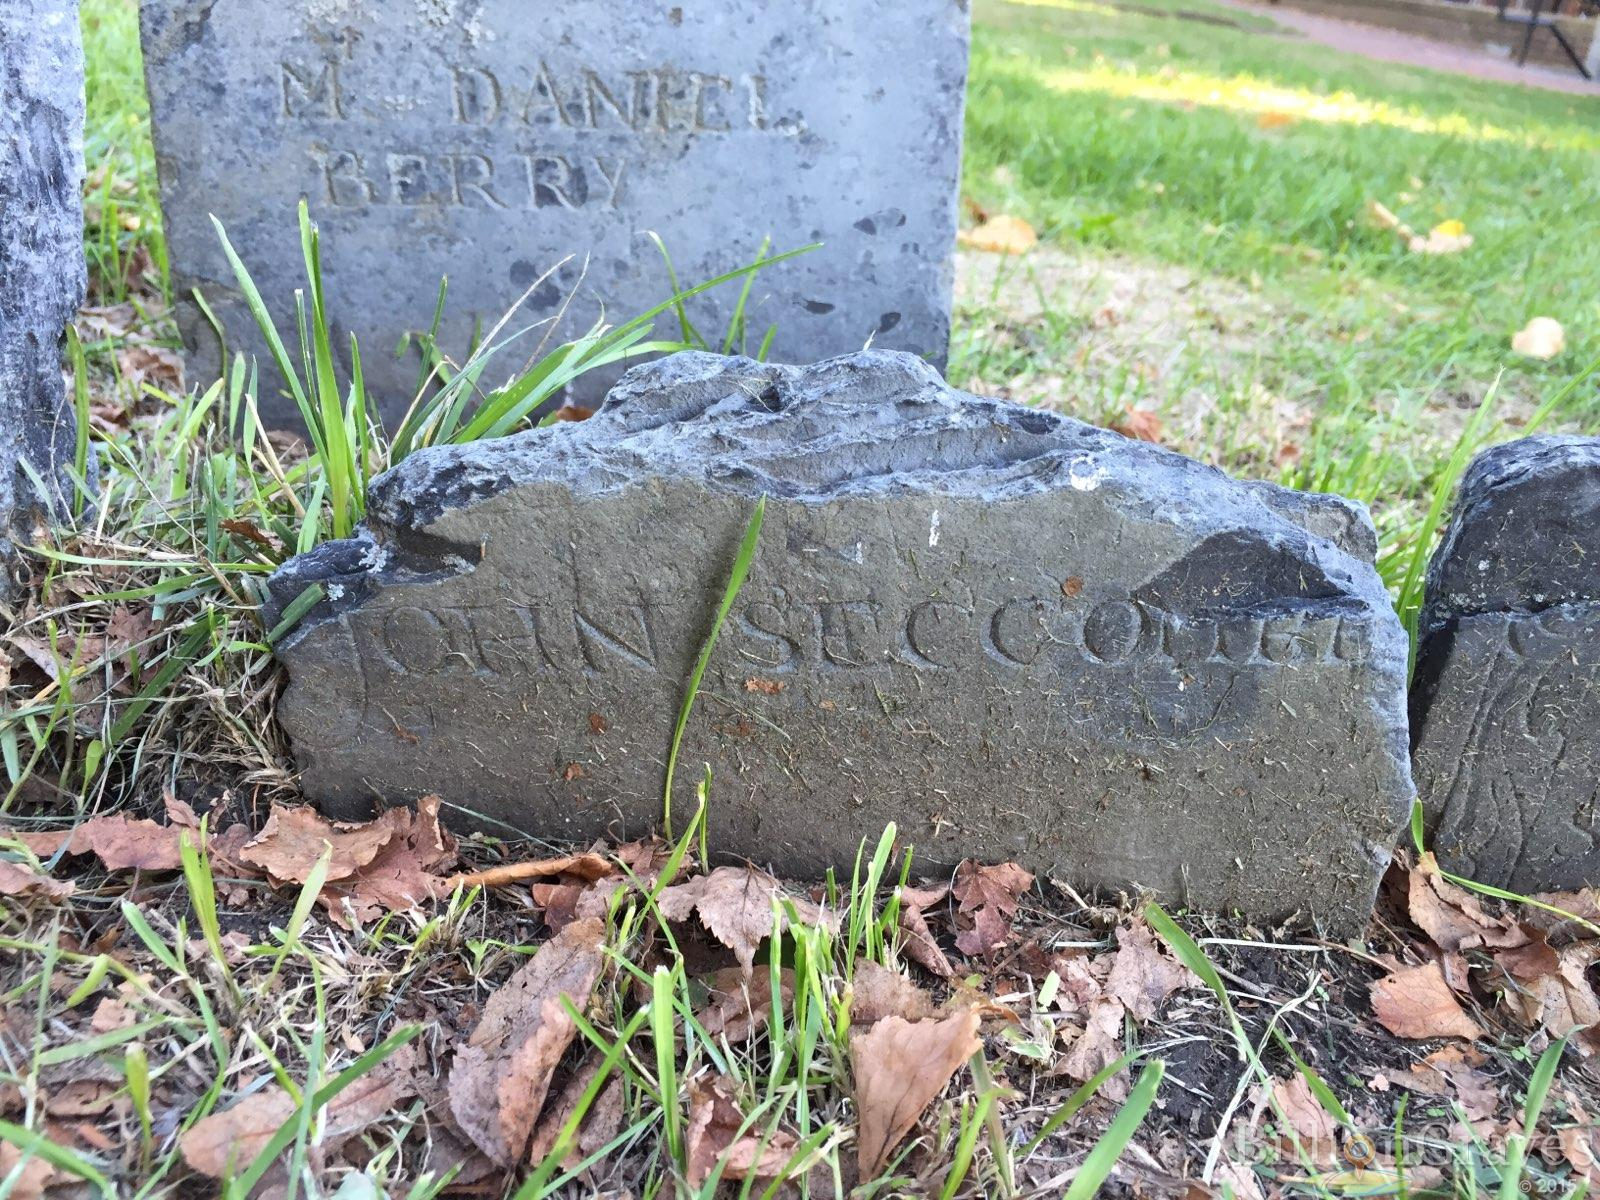 BillionGraves, gravestone, grave, damaged gravestones, cemetery, family history, ancestors, community service project, JustServe, BillionGraves app, ivy, plant growth, JustServe, Boston